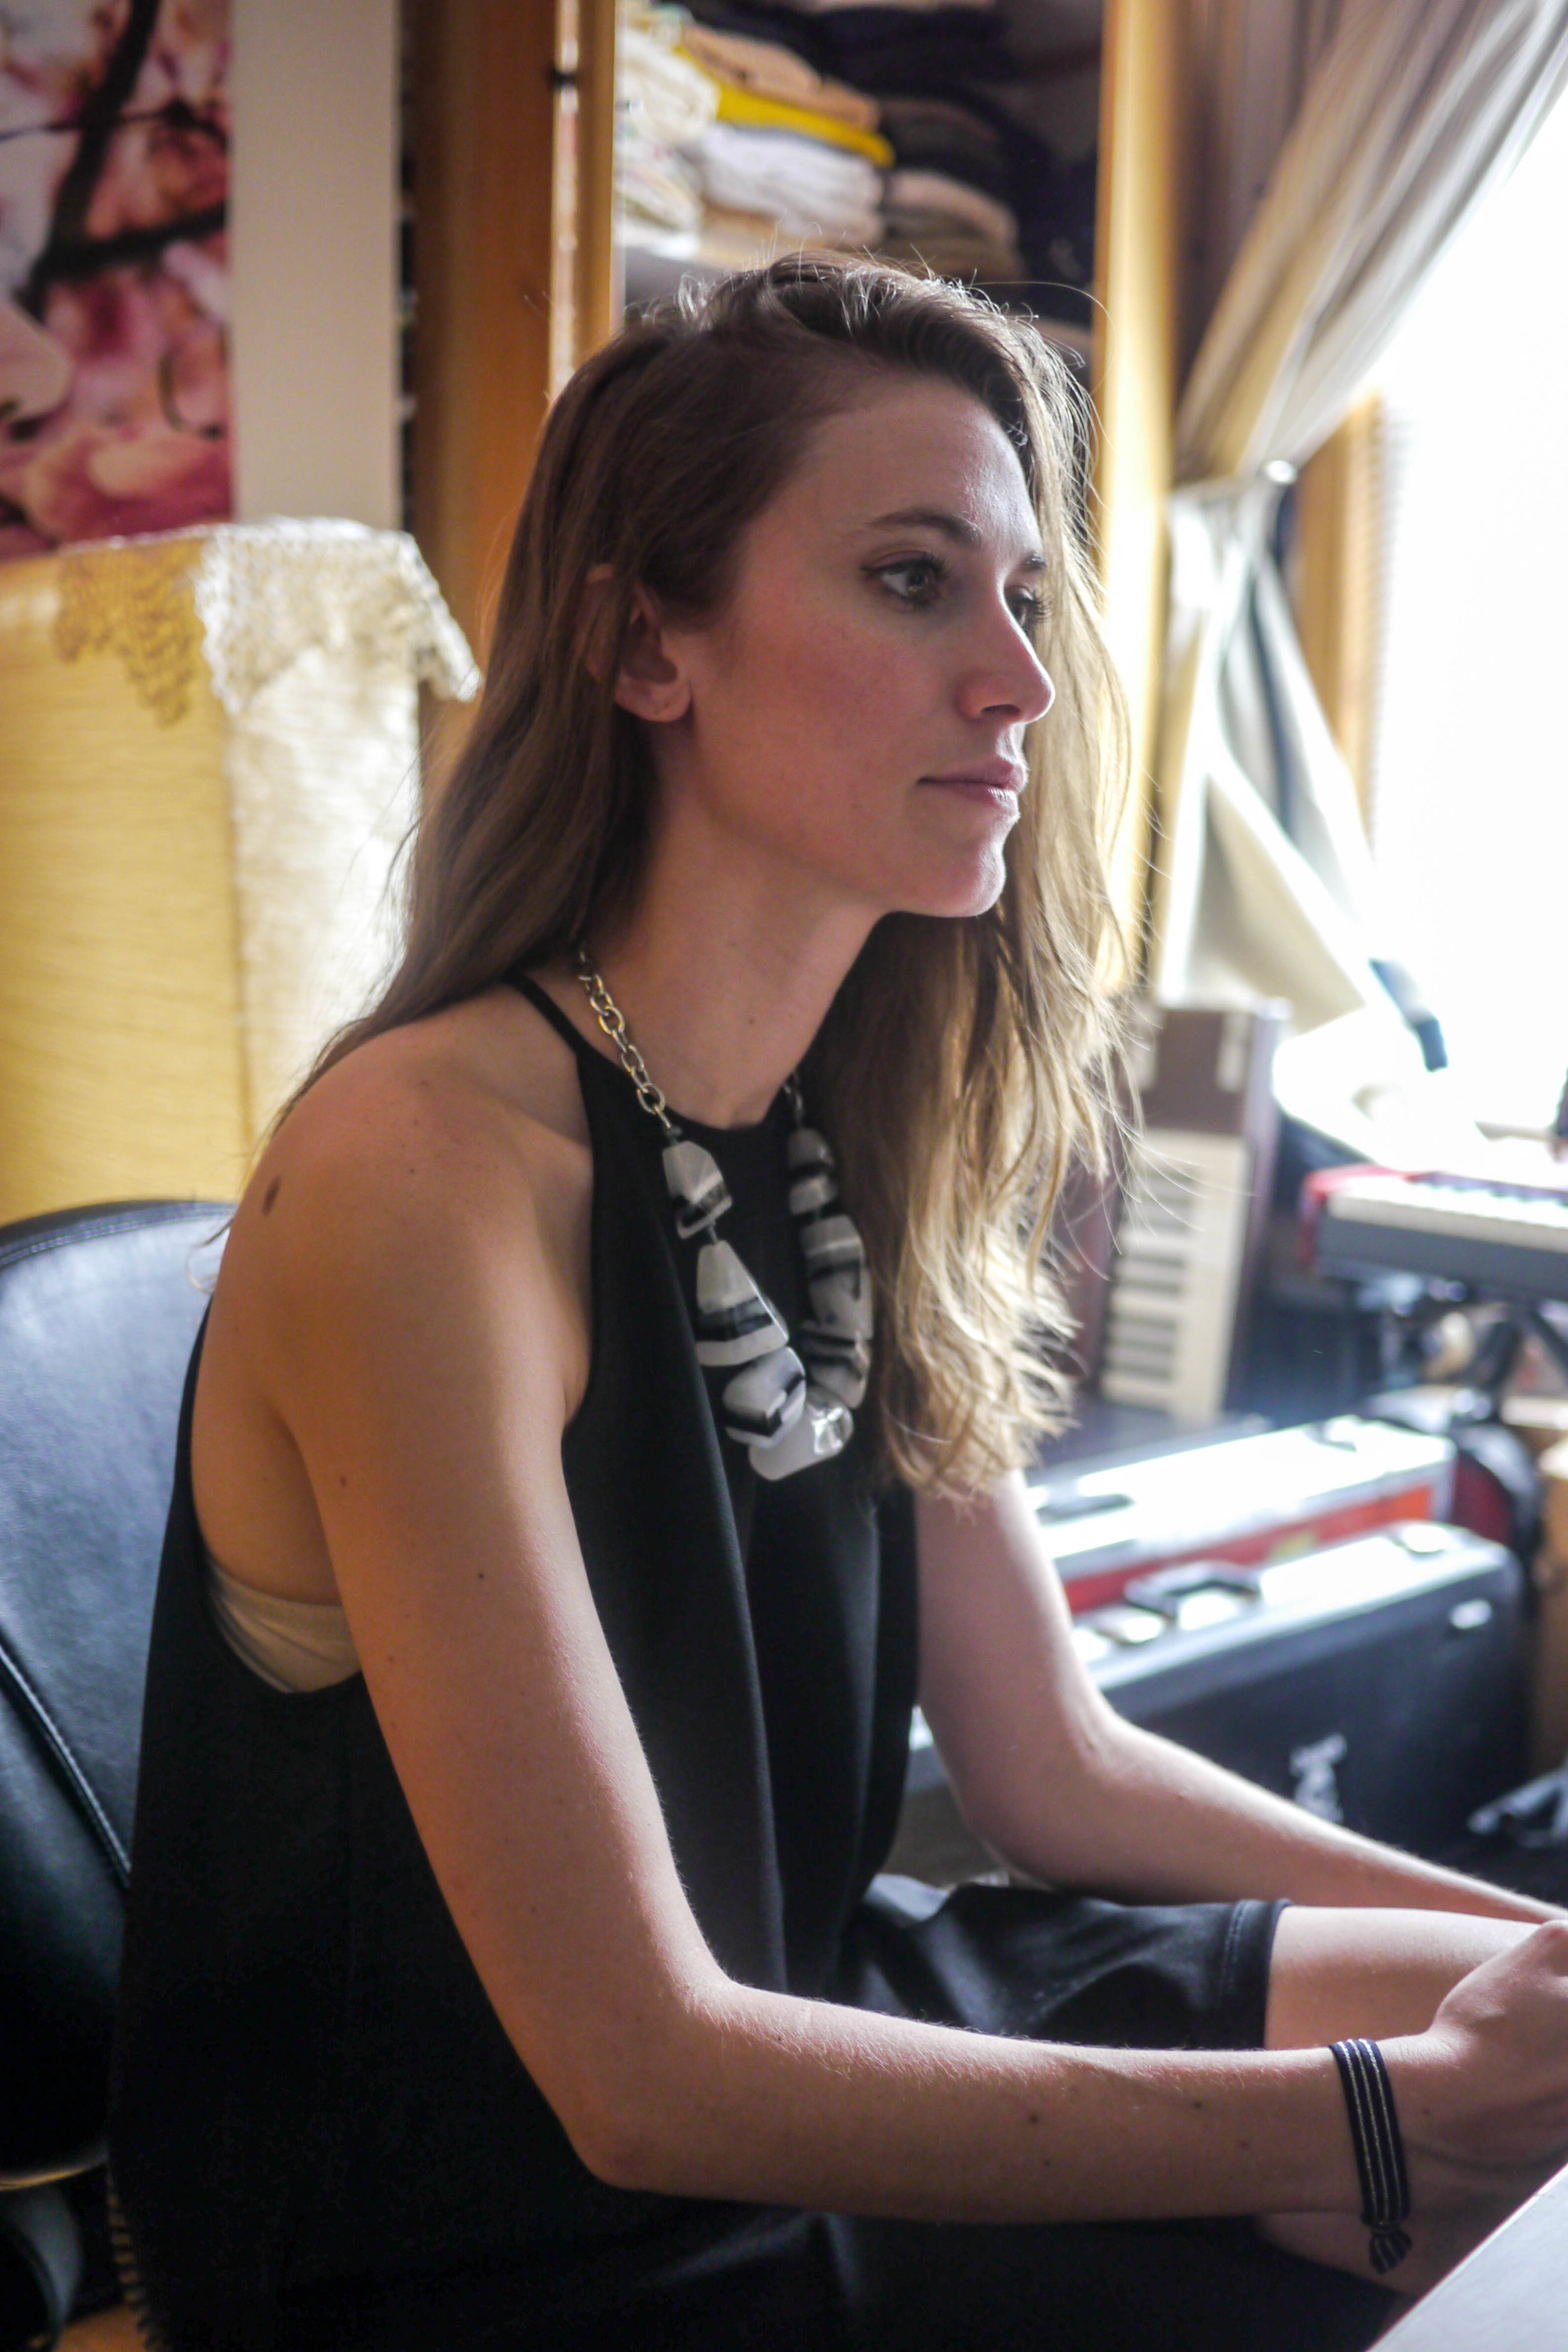 Dress: Zara, Necklace: Alter